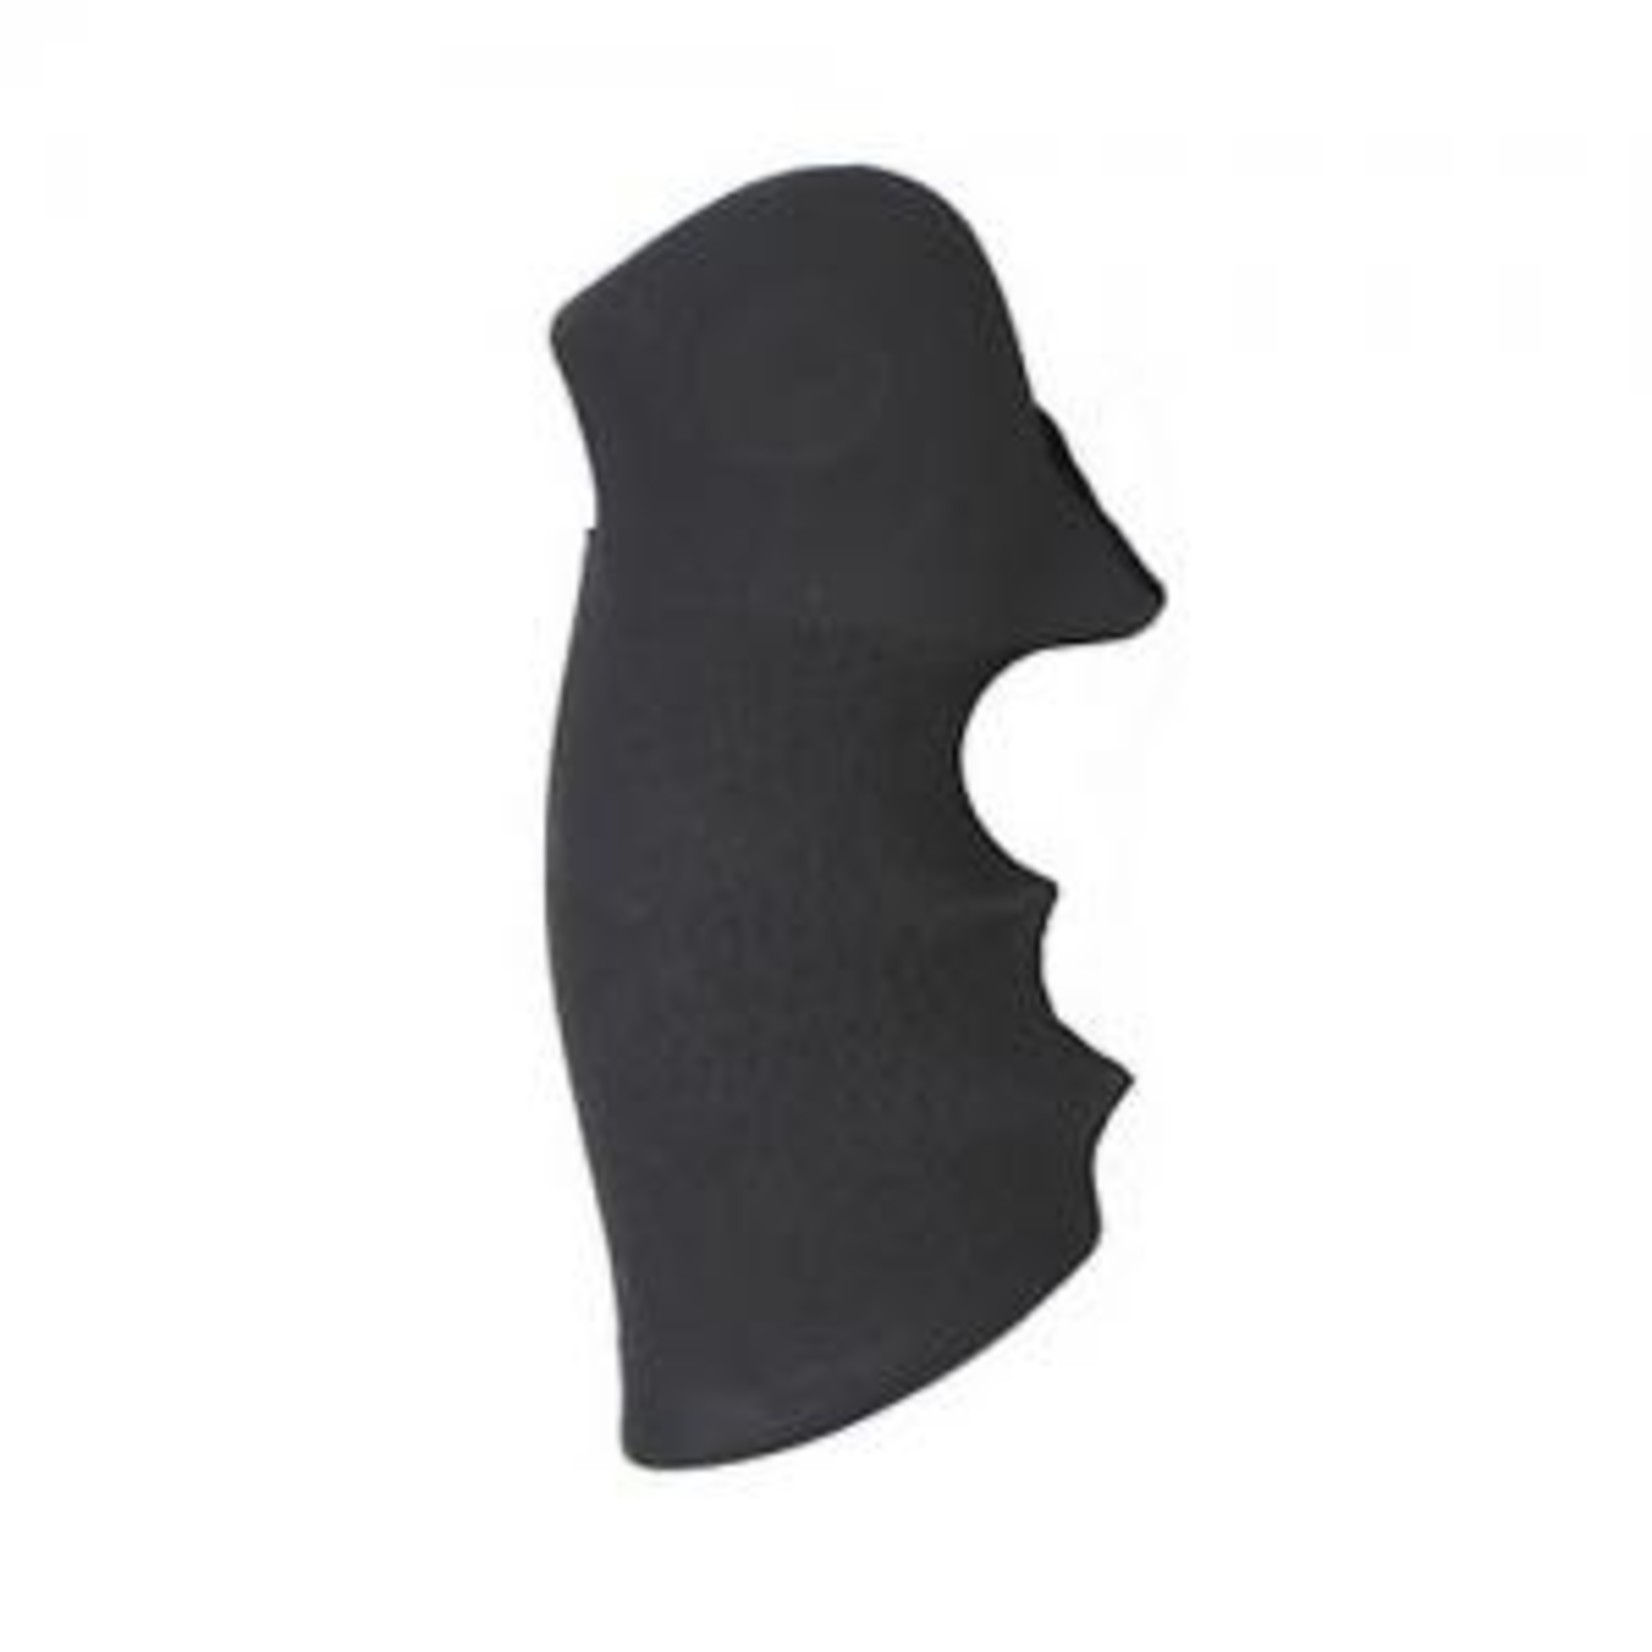 Hogue 10000 Monogrip Rubber Grips-S&W K L Frame-Sq Butt W/Finger